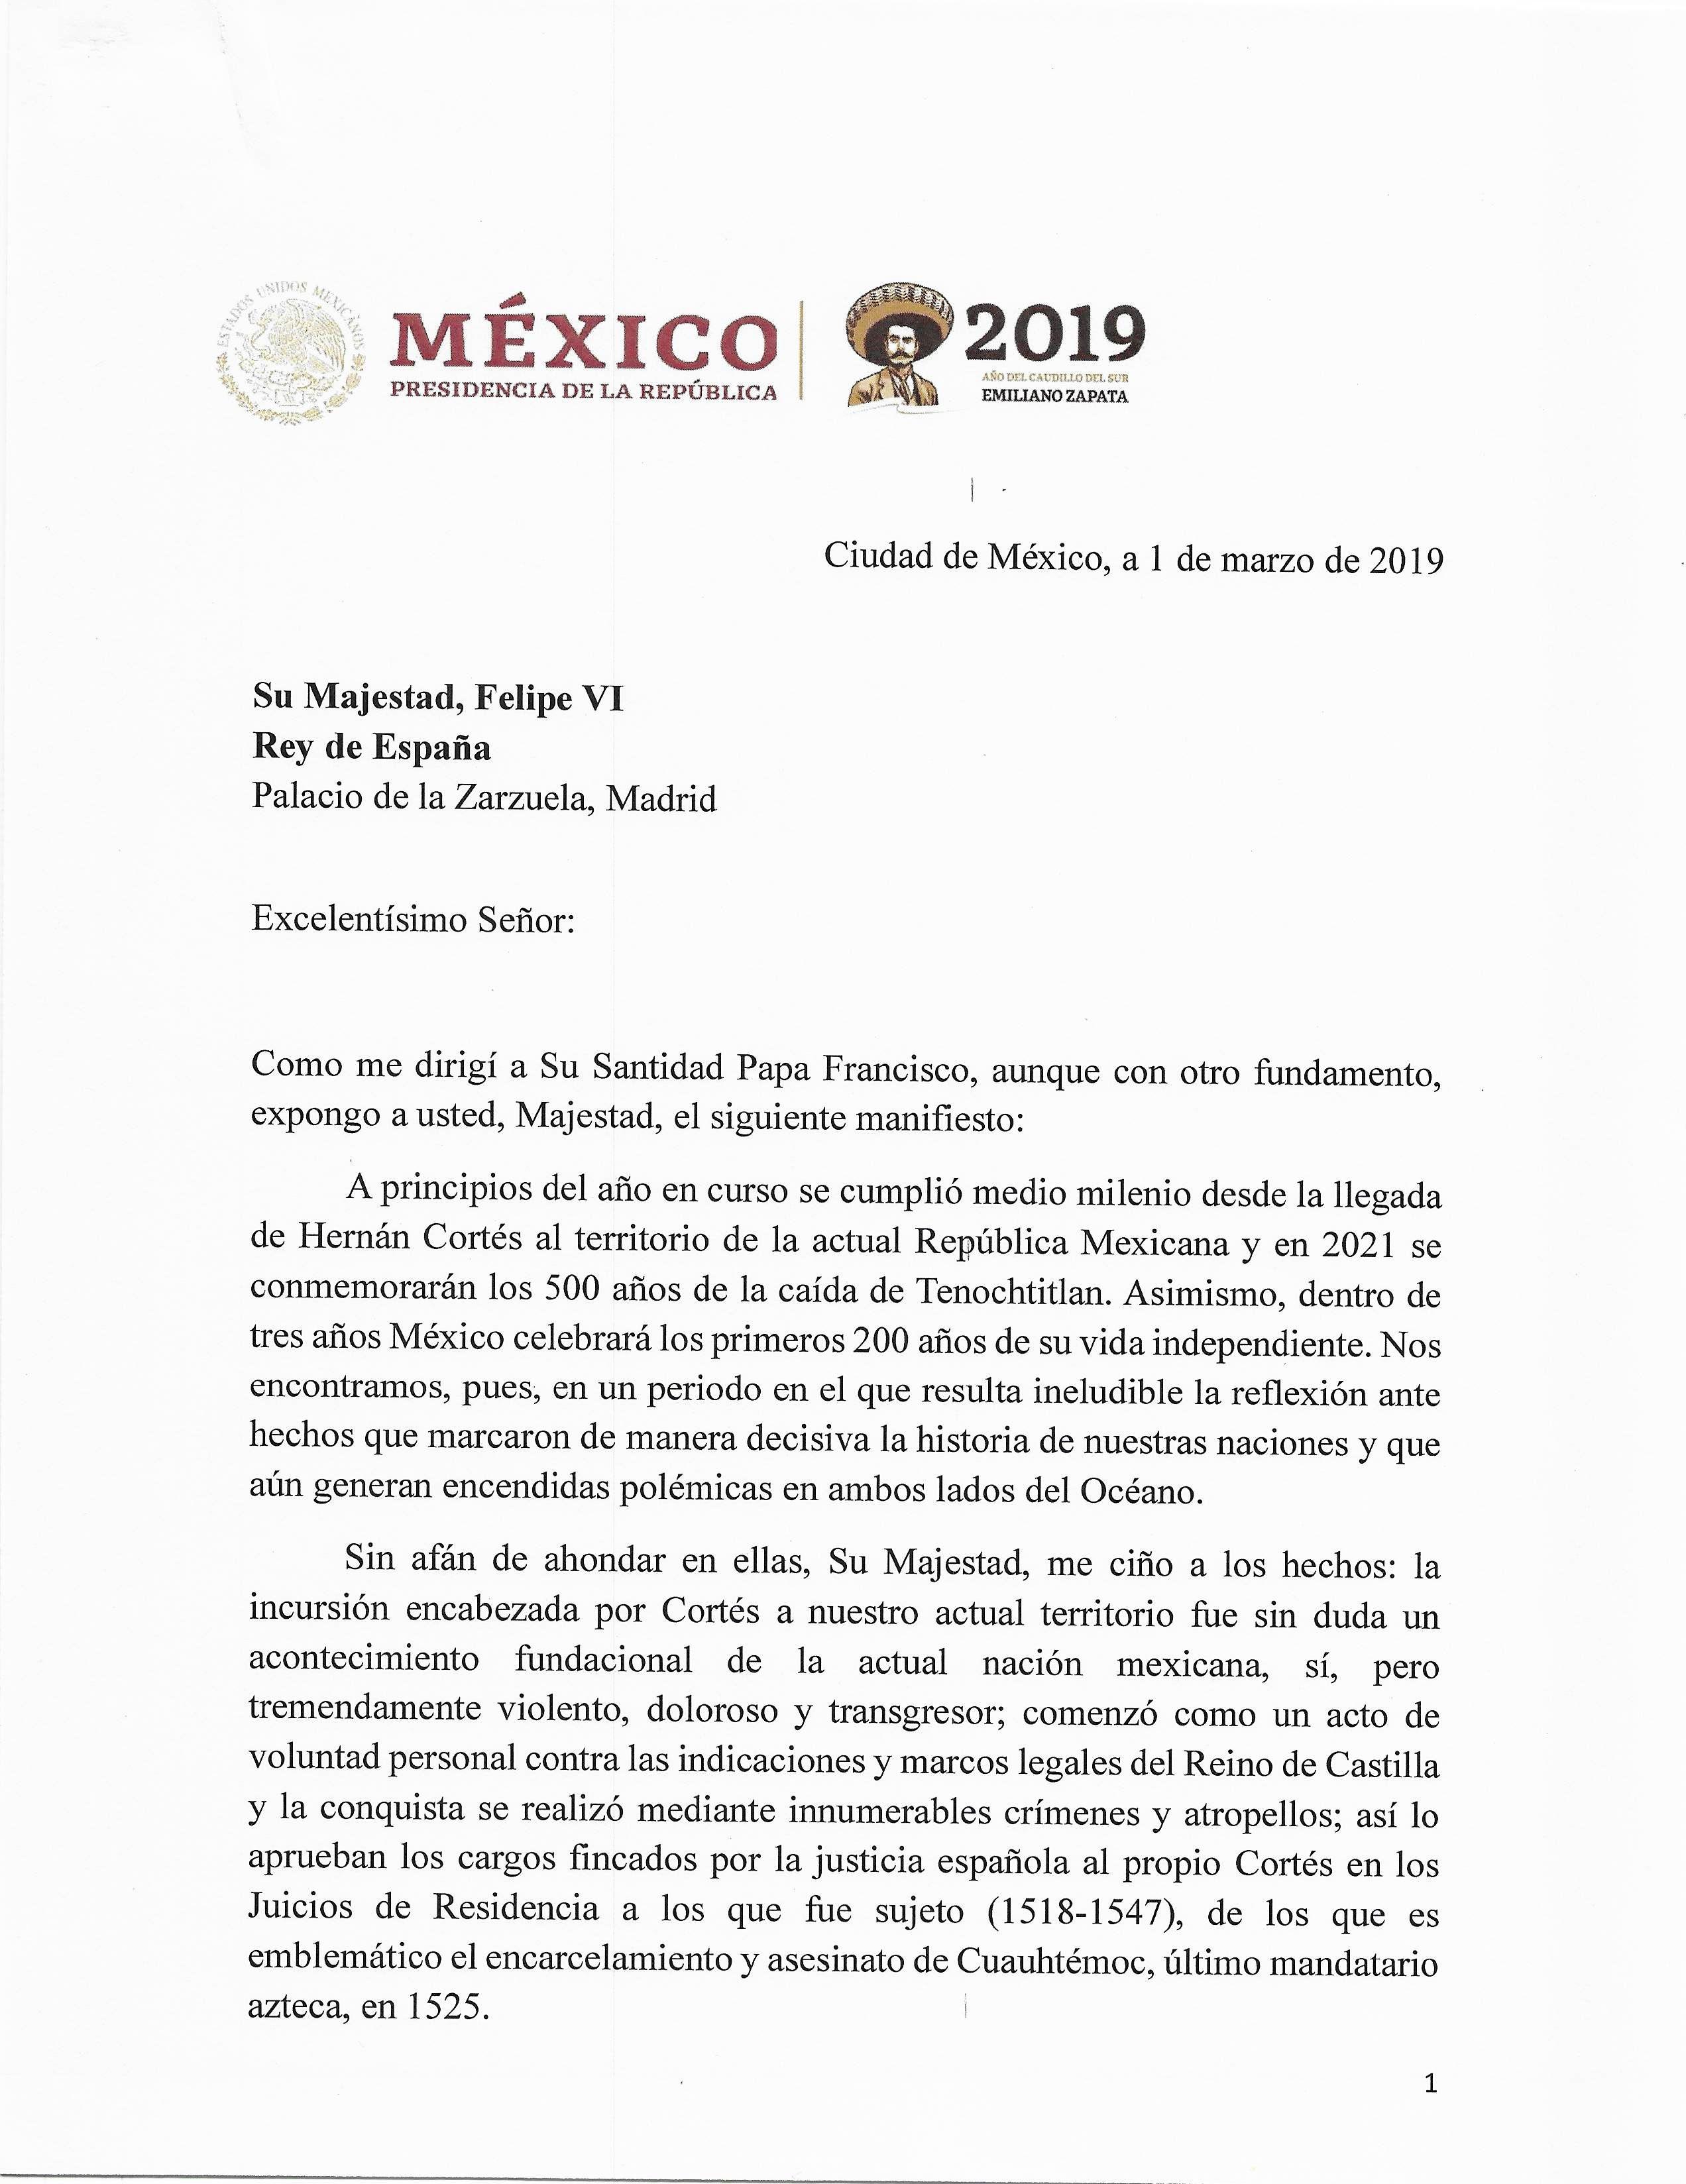 CARTA AMLO - REY - ESPANA - MEXICO - 11012021